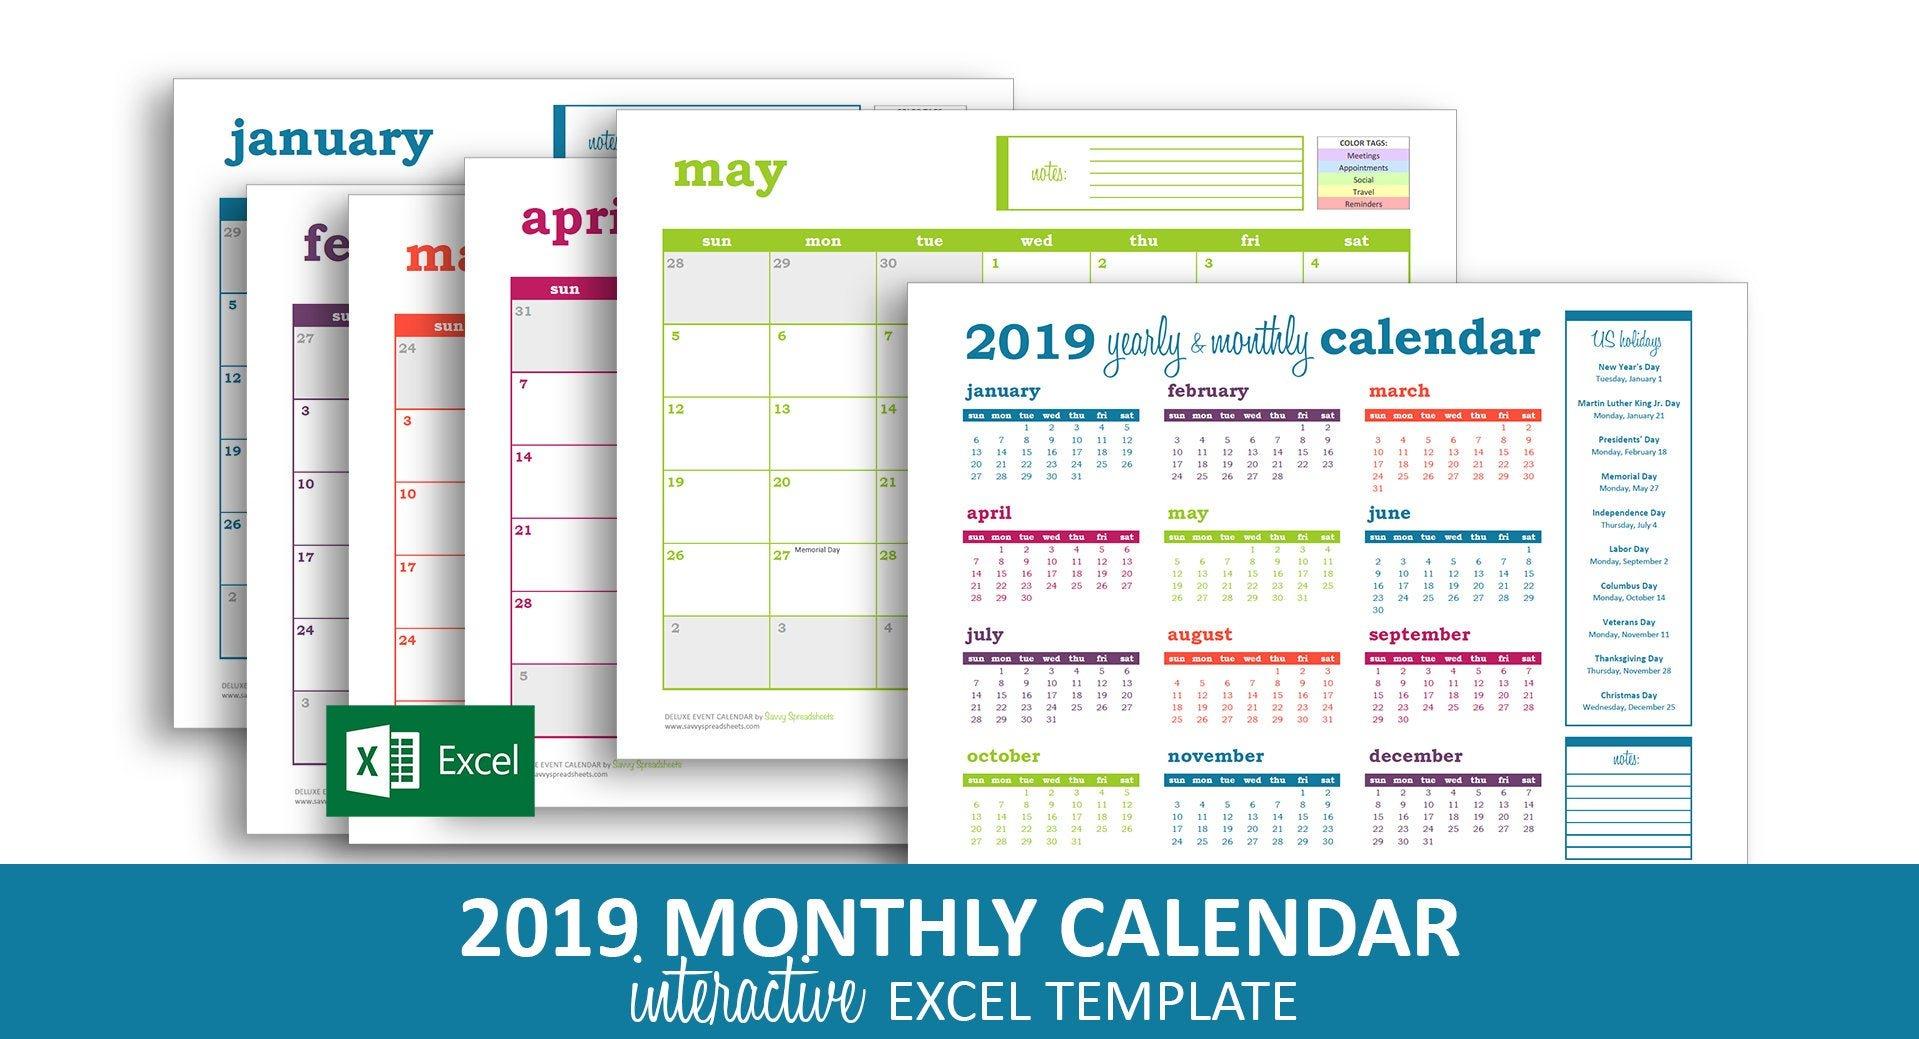 Deluxe Event Calendar 2019 Excel Template Printable | Etsy Calendar 2019 Excel Romania